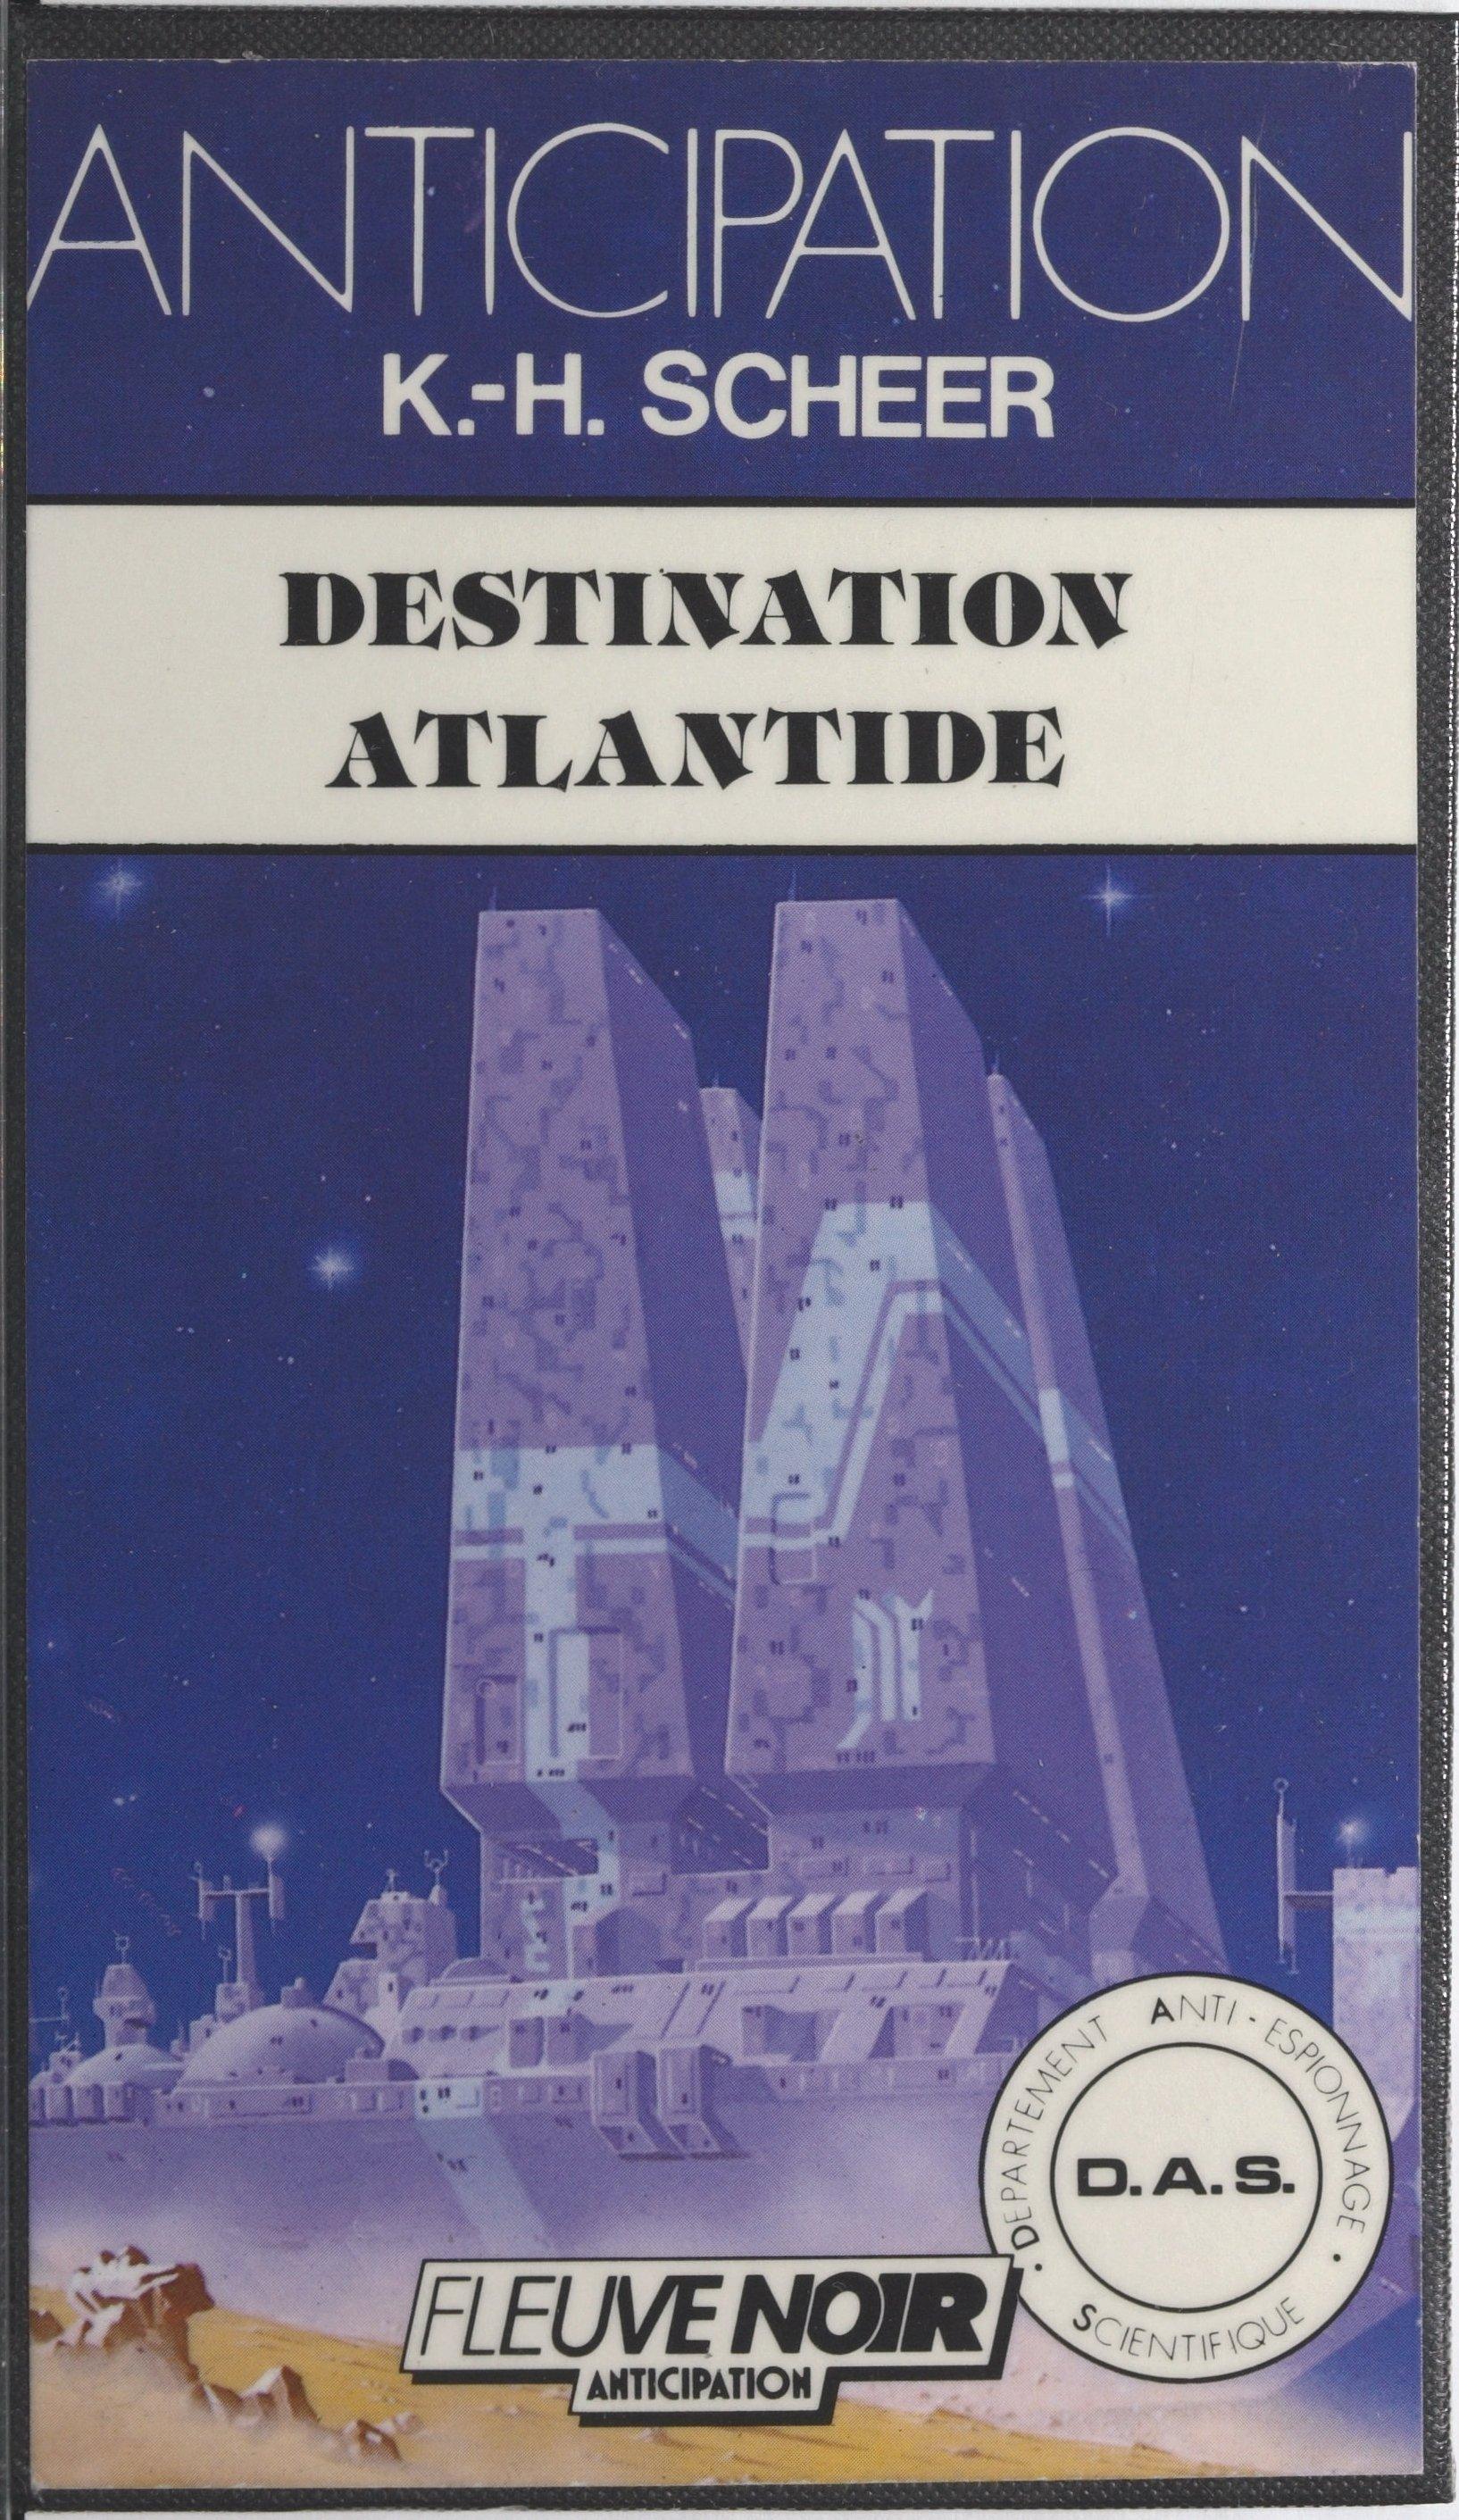 Destination Atlantide